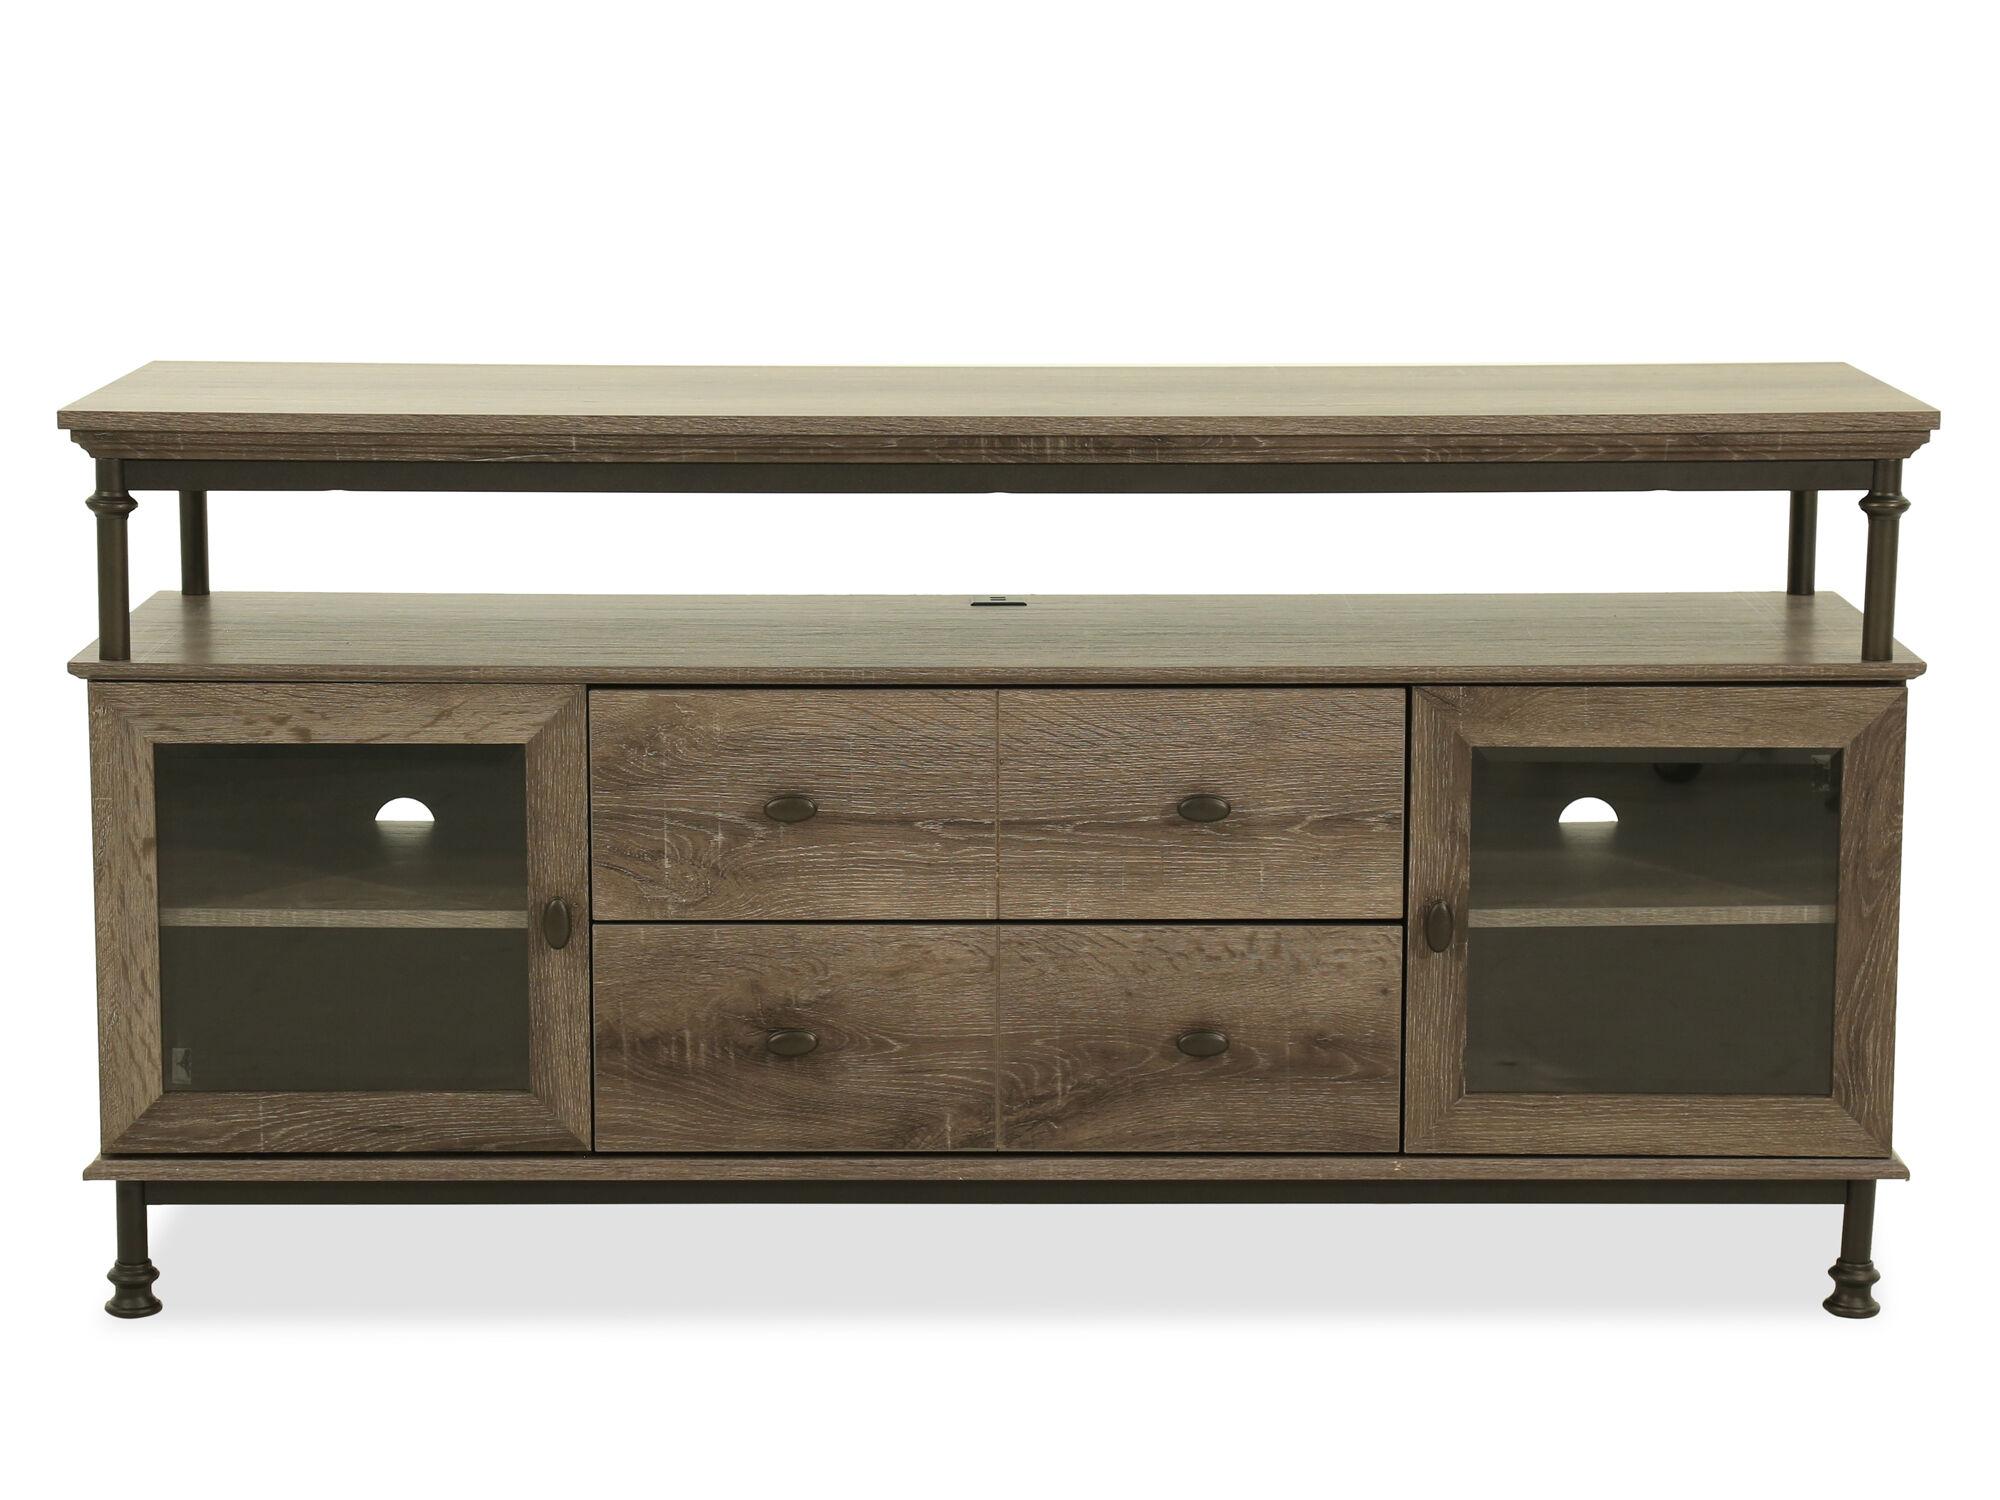 sofas tulsa ok design sofa online industrial entertainment credenza in northern oak   mathis ...